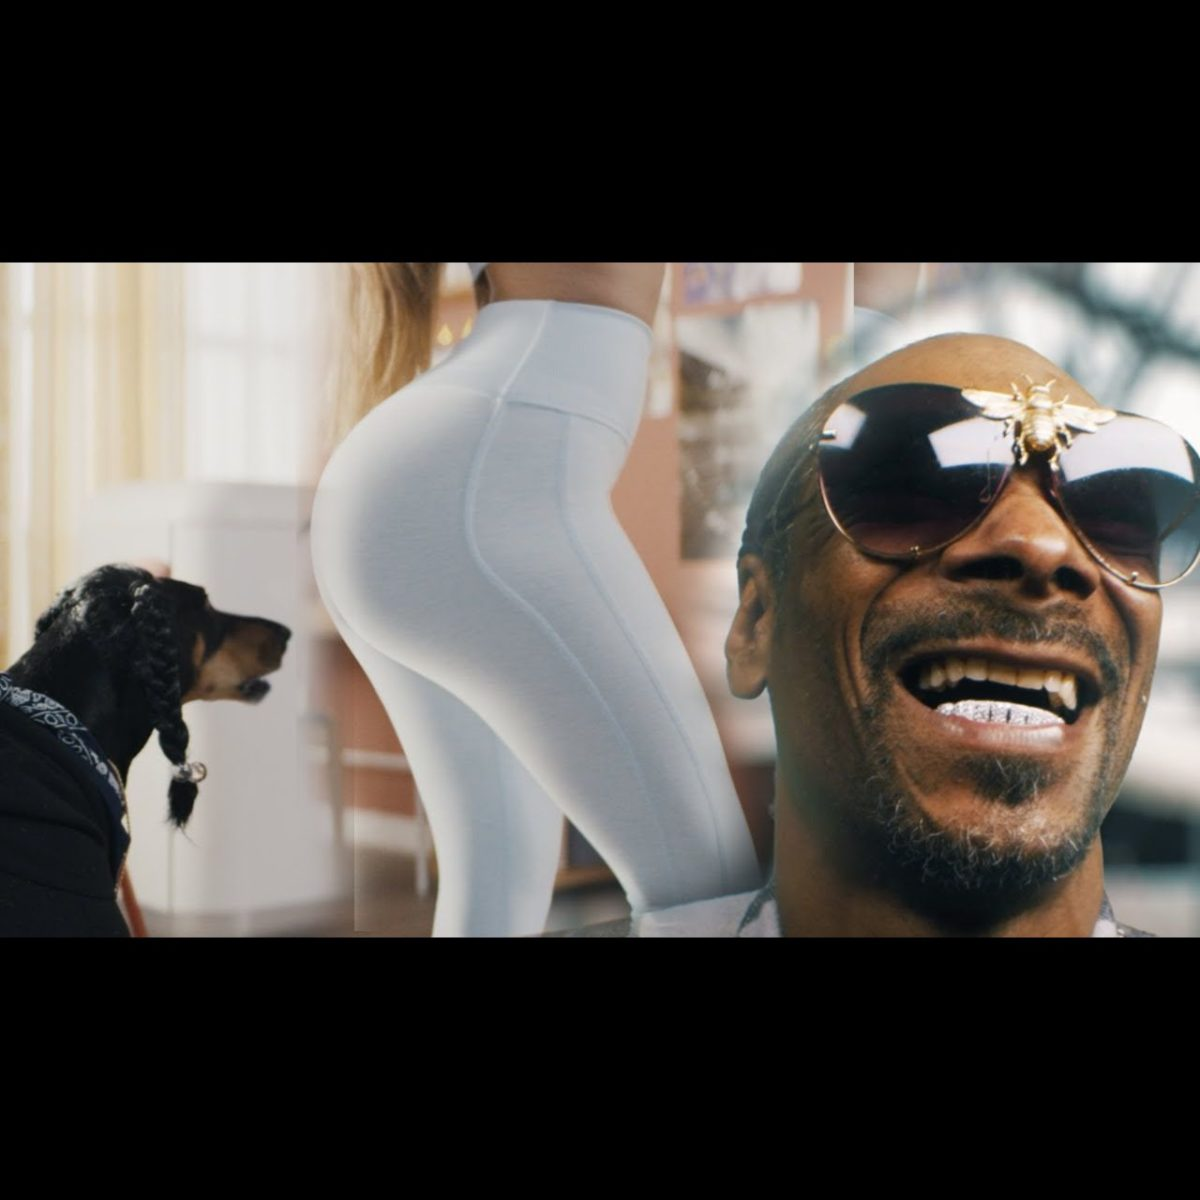 Snoop Dogg - I C Your Bullshit (Thumbnail)